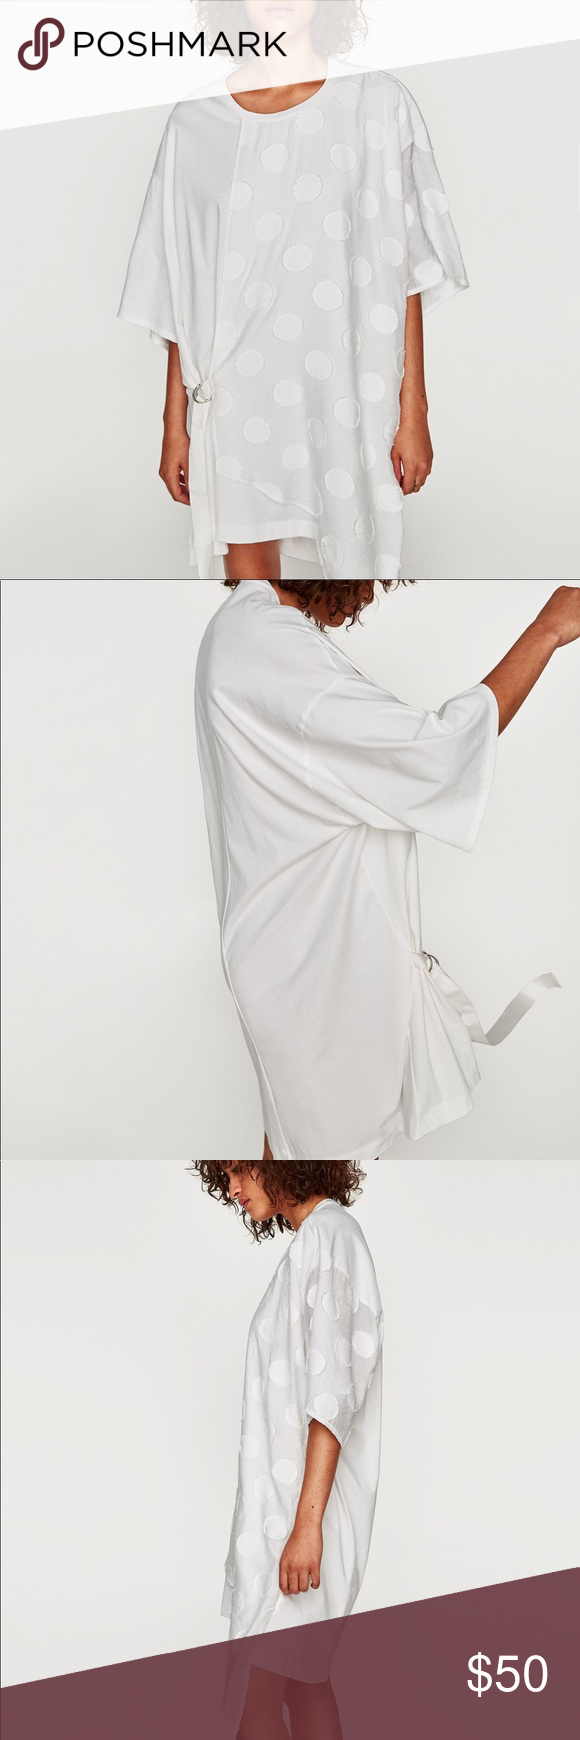 f872c33f93c NWT Zara White Asymmetric Polka Dot T Shirt Dress White oversized shirt  polka dot dress with side tie. Polka dot dress with round neck and short  sleeves.